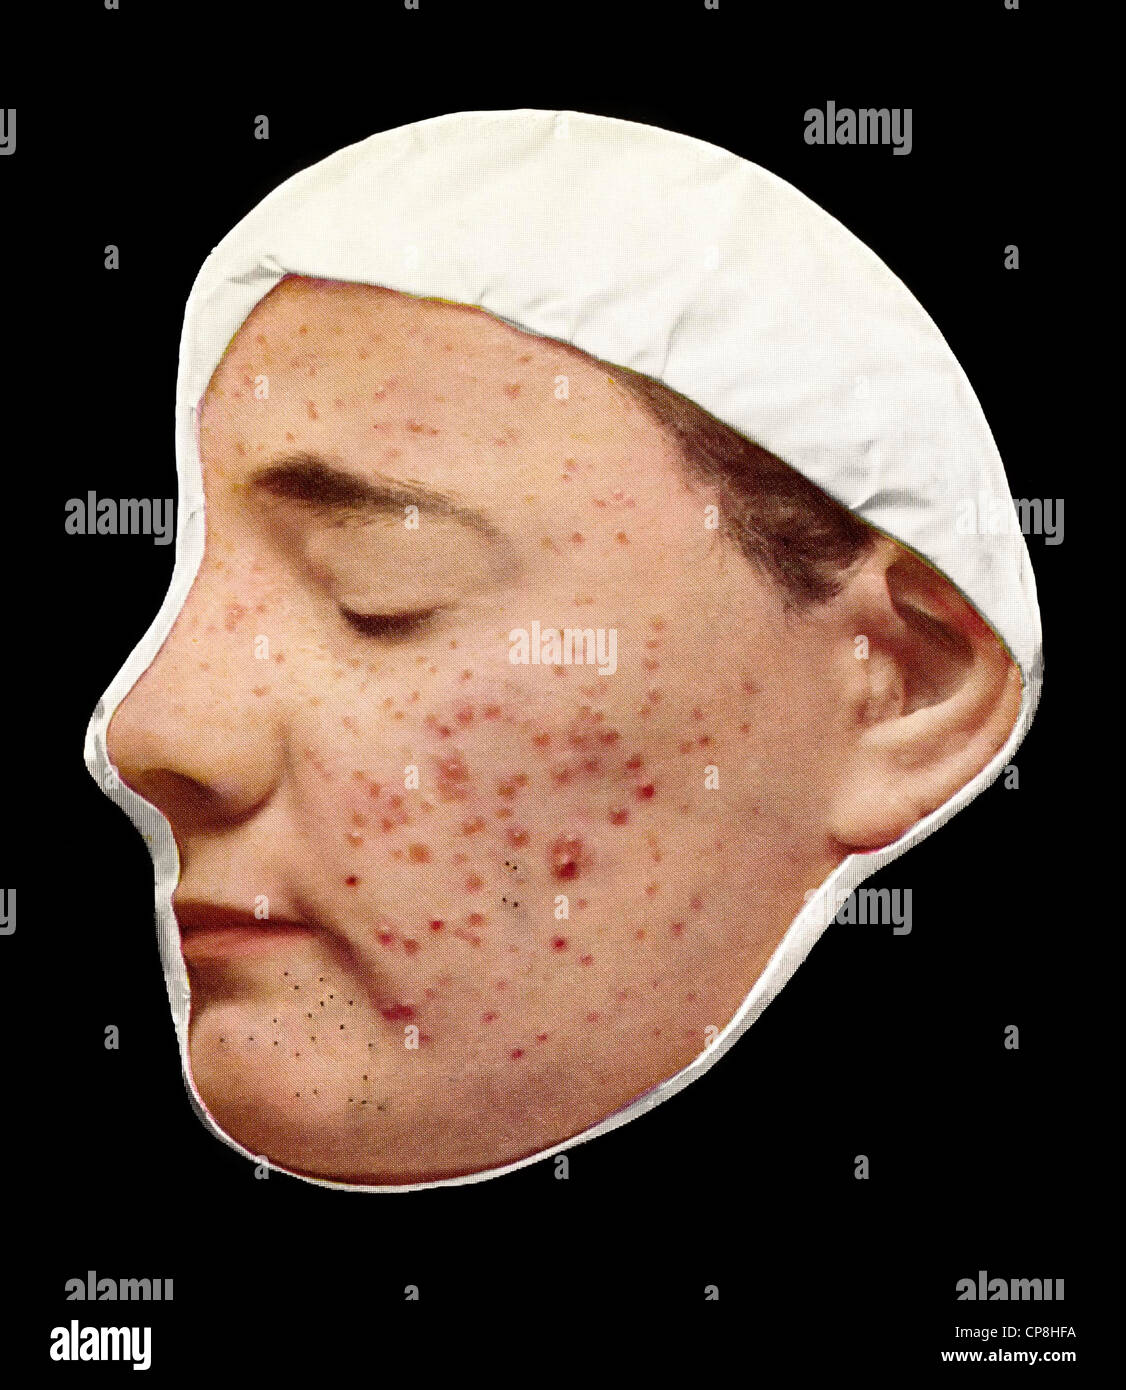 Acne vulgaris stock photos acne vulgaris stock images for Mobel 19 jahrhundert